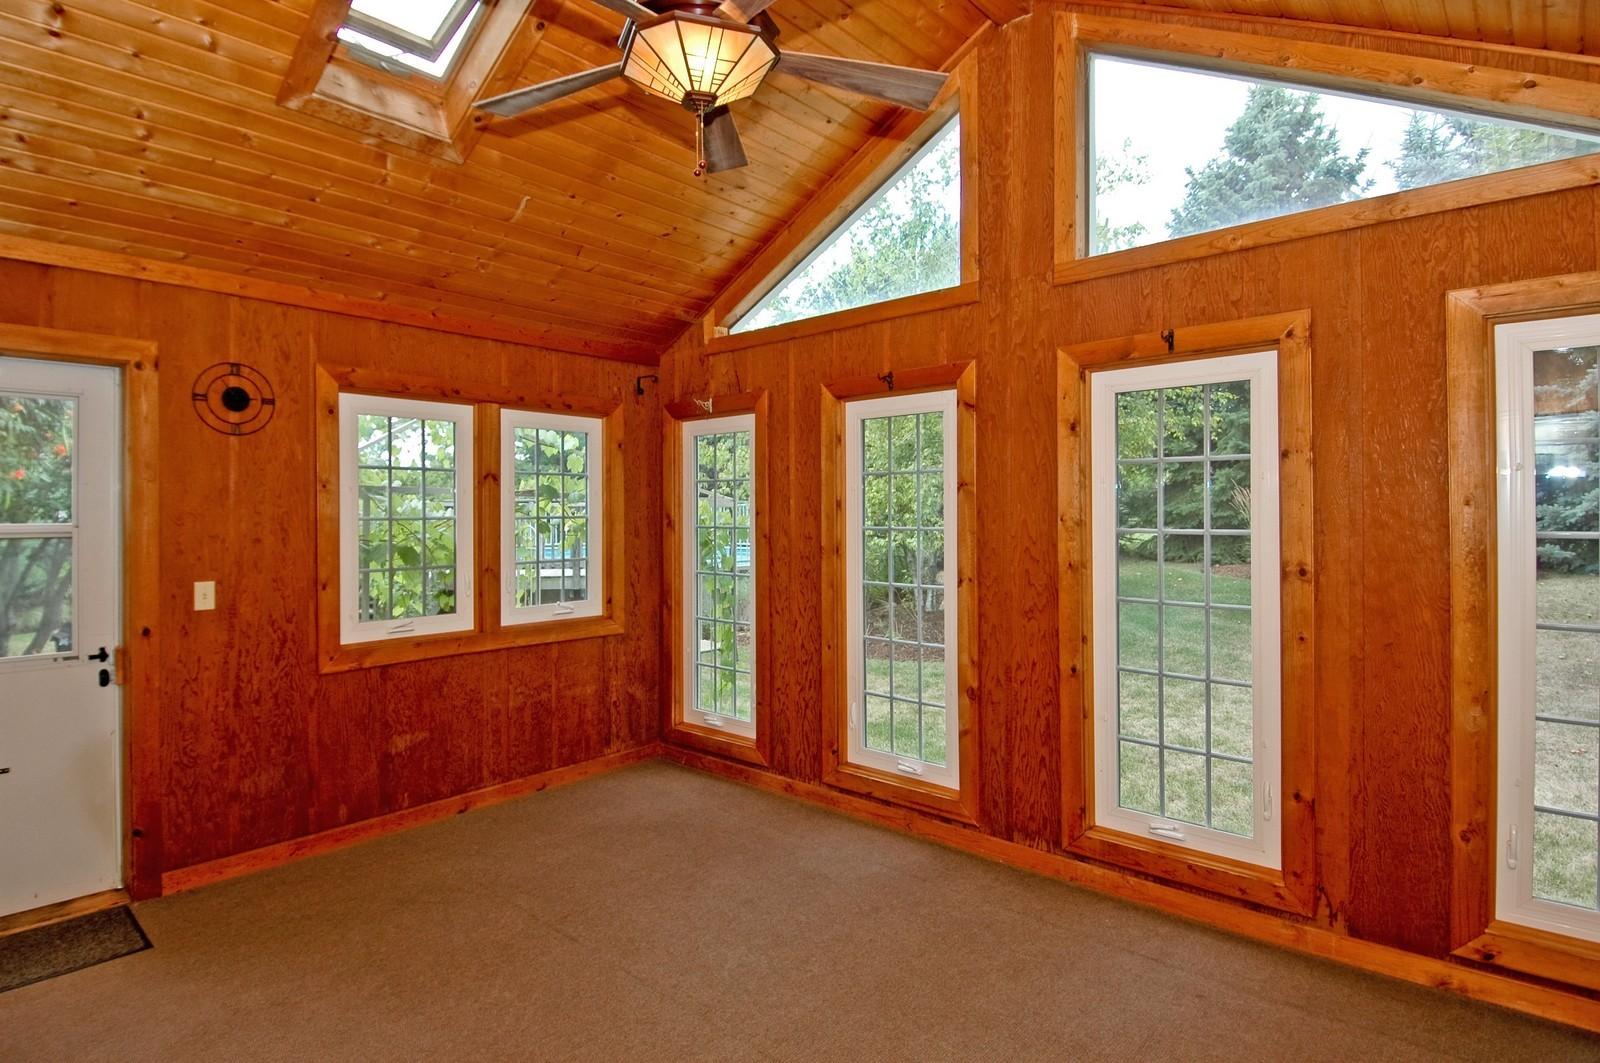 Real Estate Photography - 1435 Brandywine Cir, Algonquin, IL, 60102 - Three season room